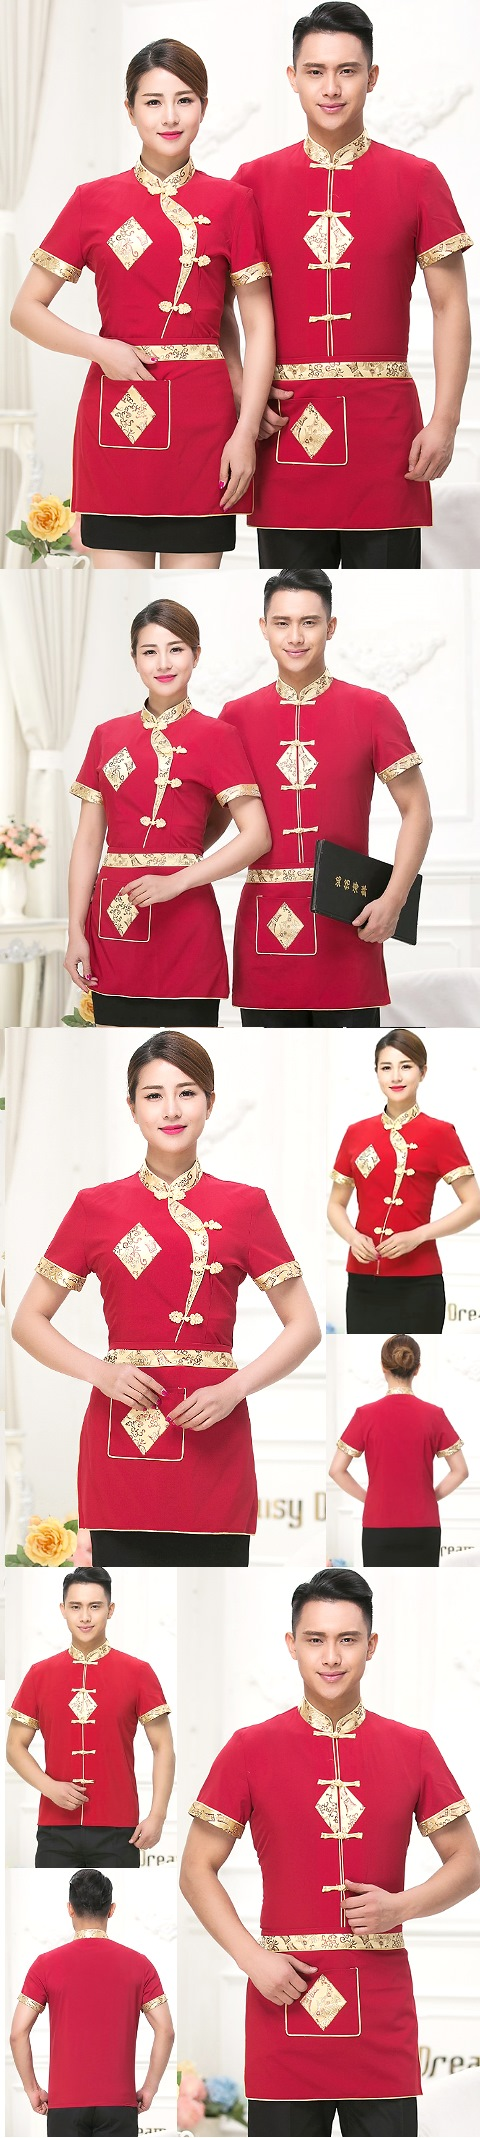 Mandarin Style Restaurant Uniform-Top (Crimson)